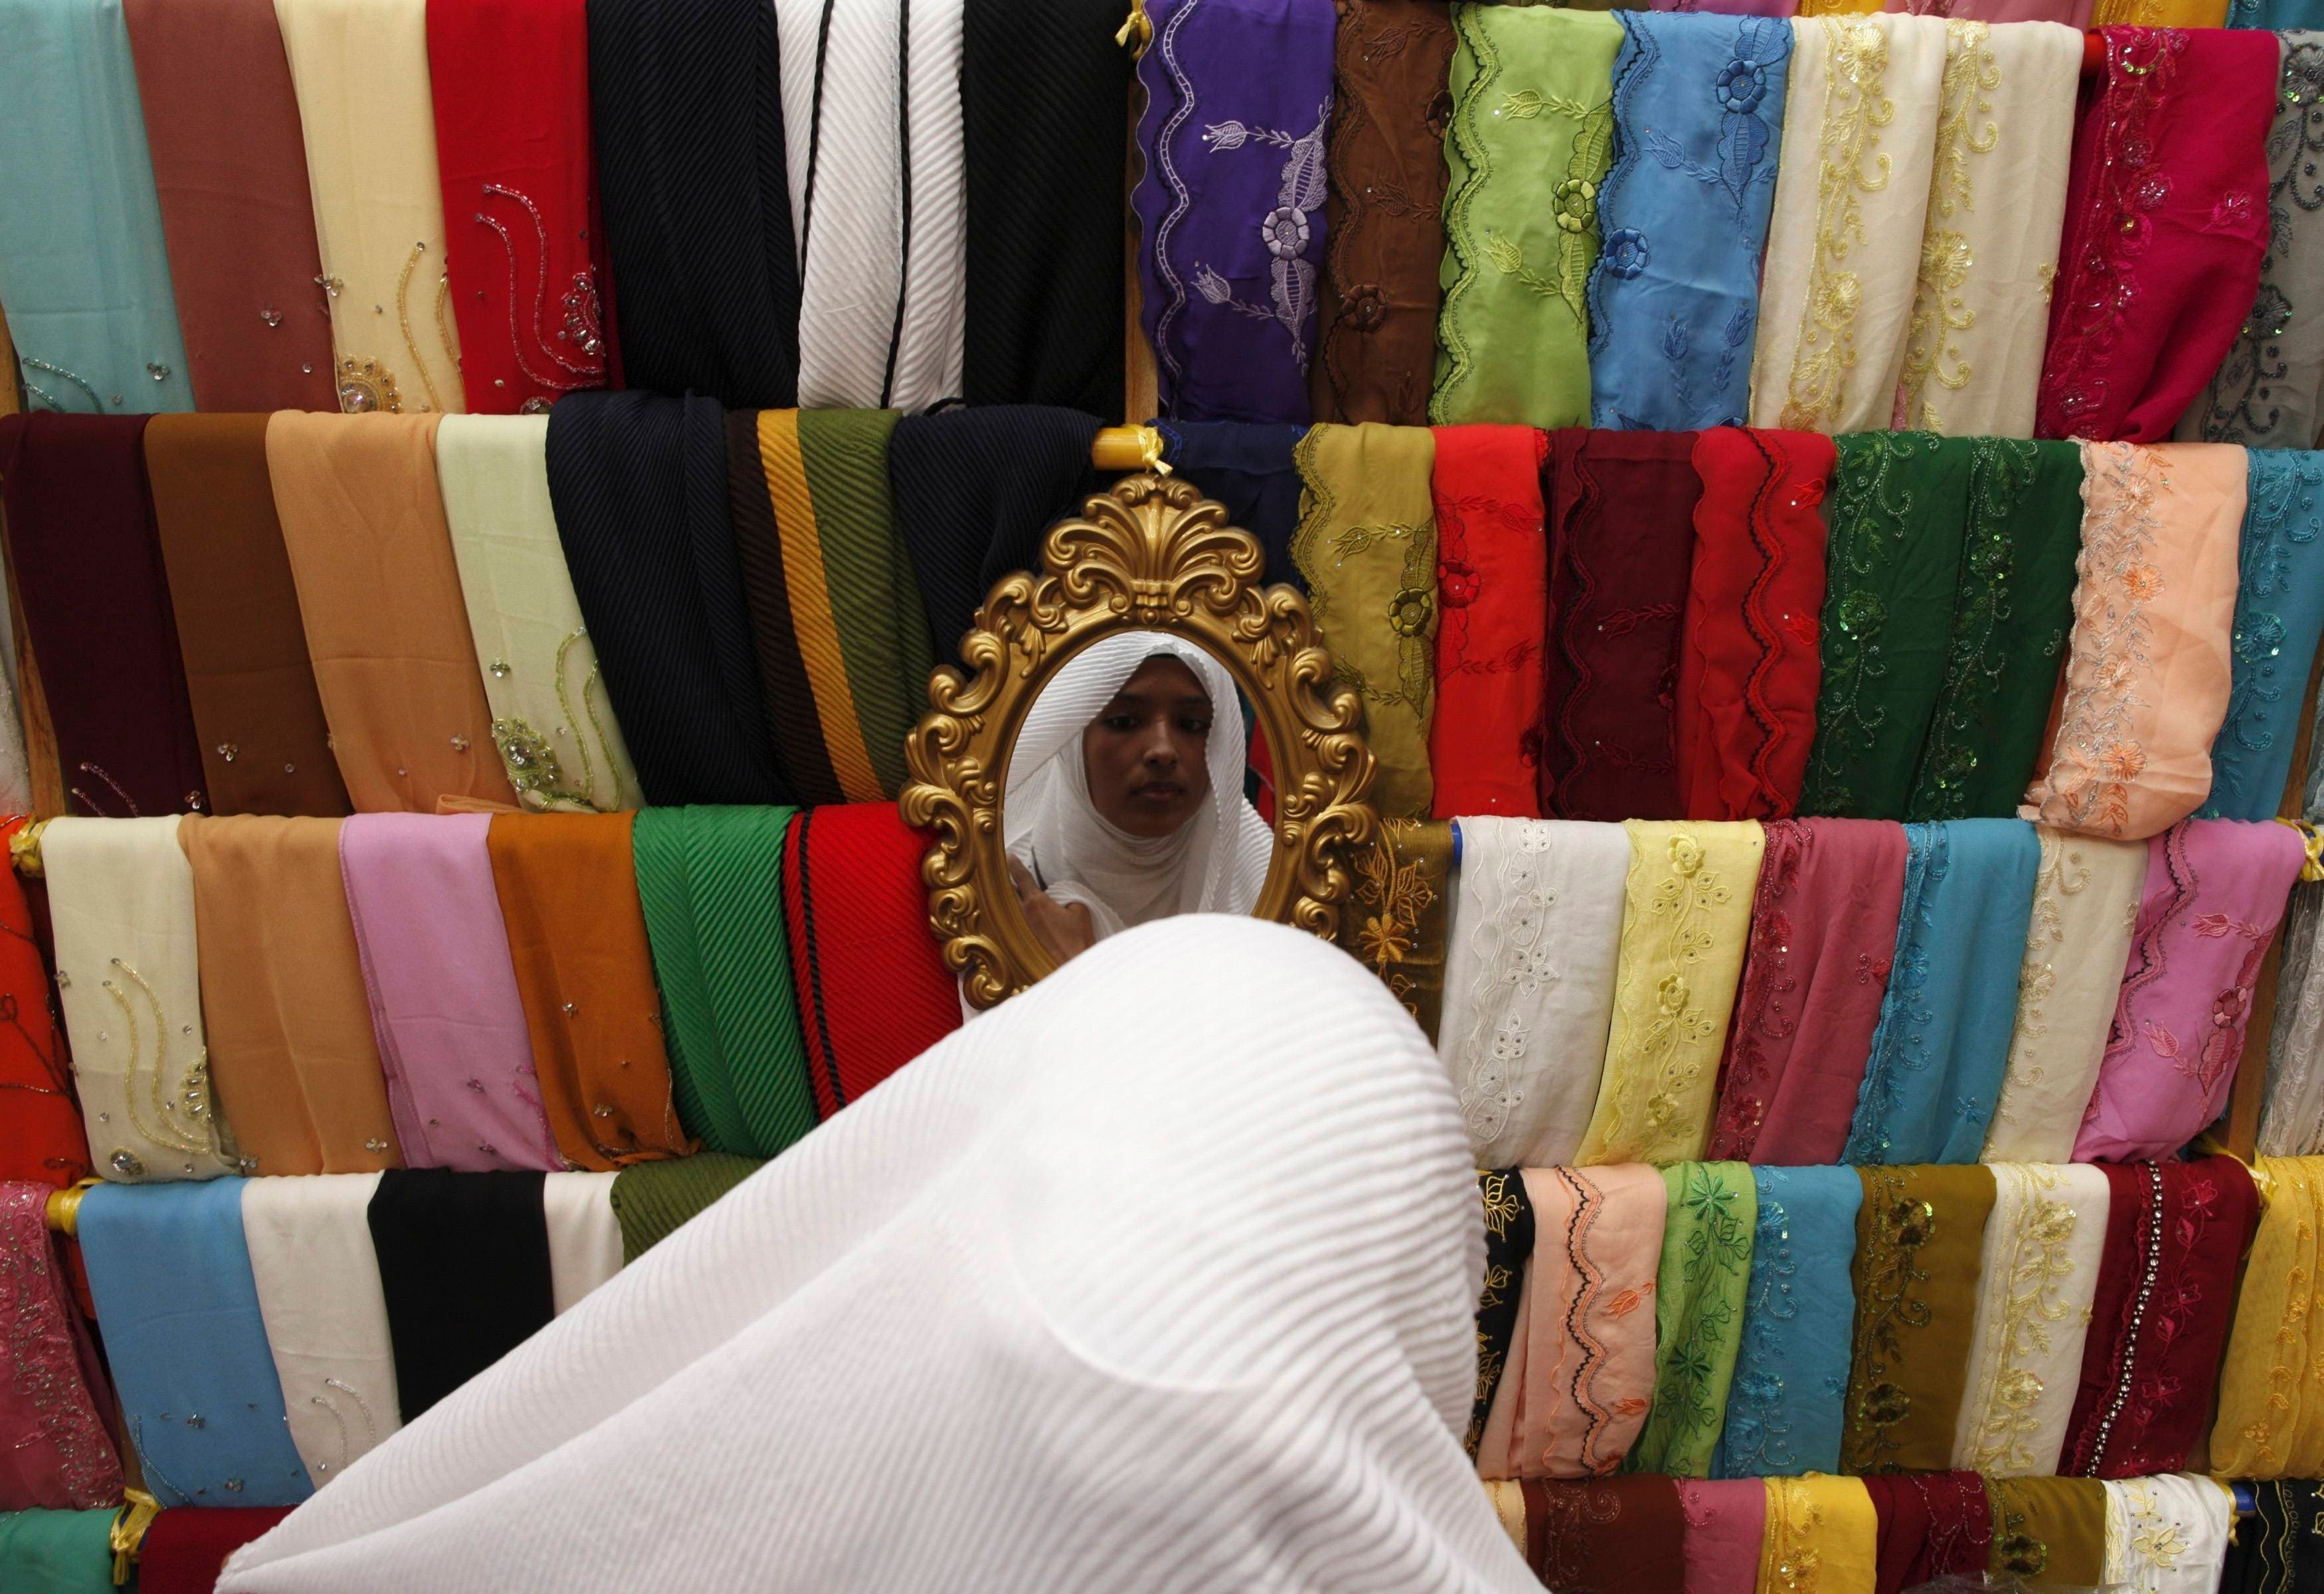 Muslims prepare for Eid al-Fitr